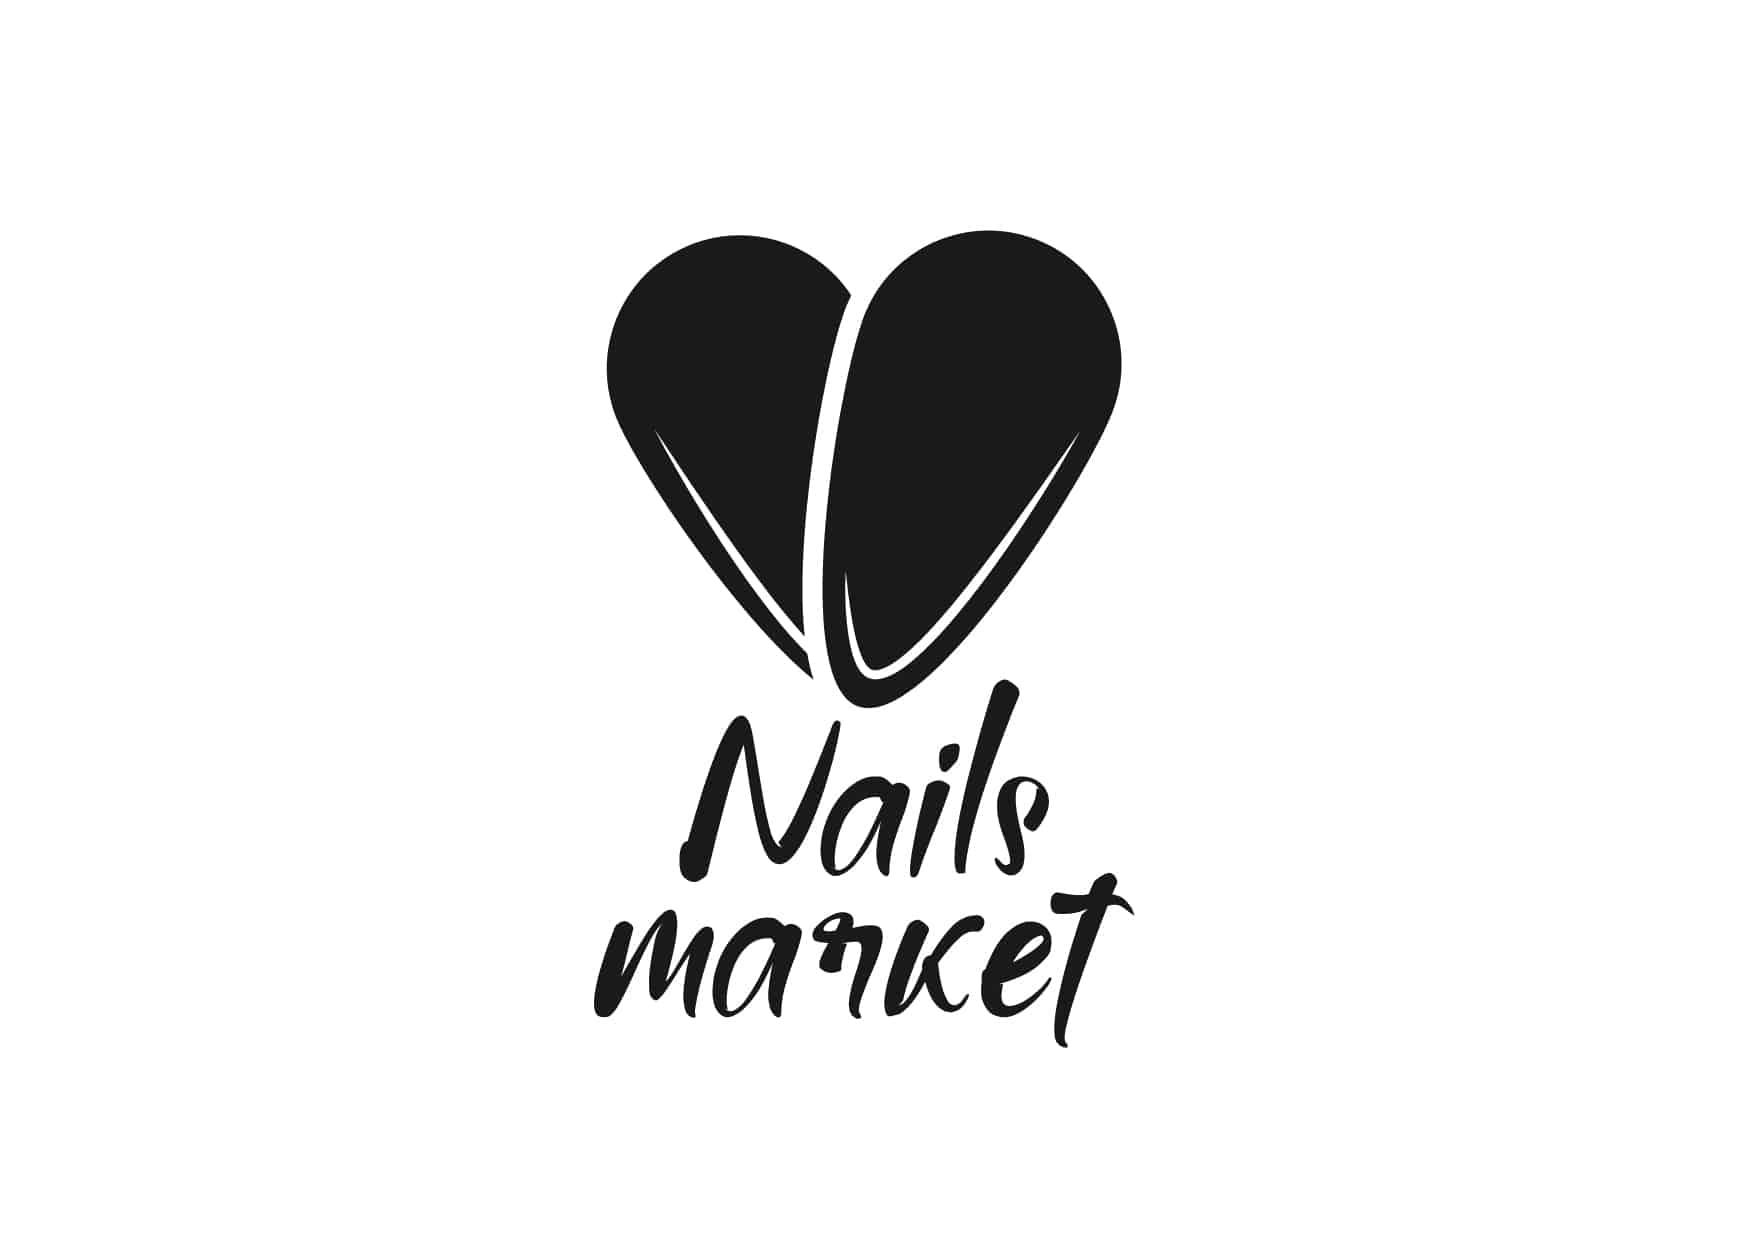 логотип интернет магазина nails market